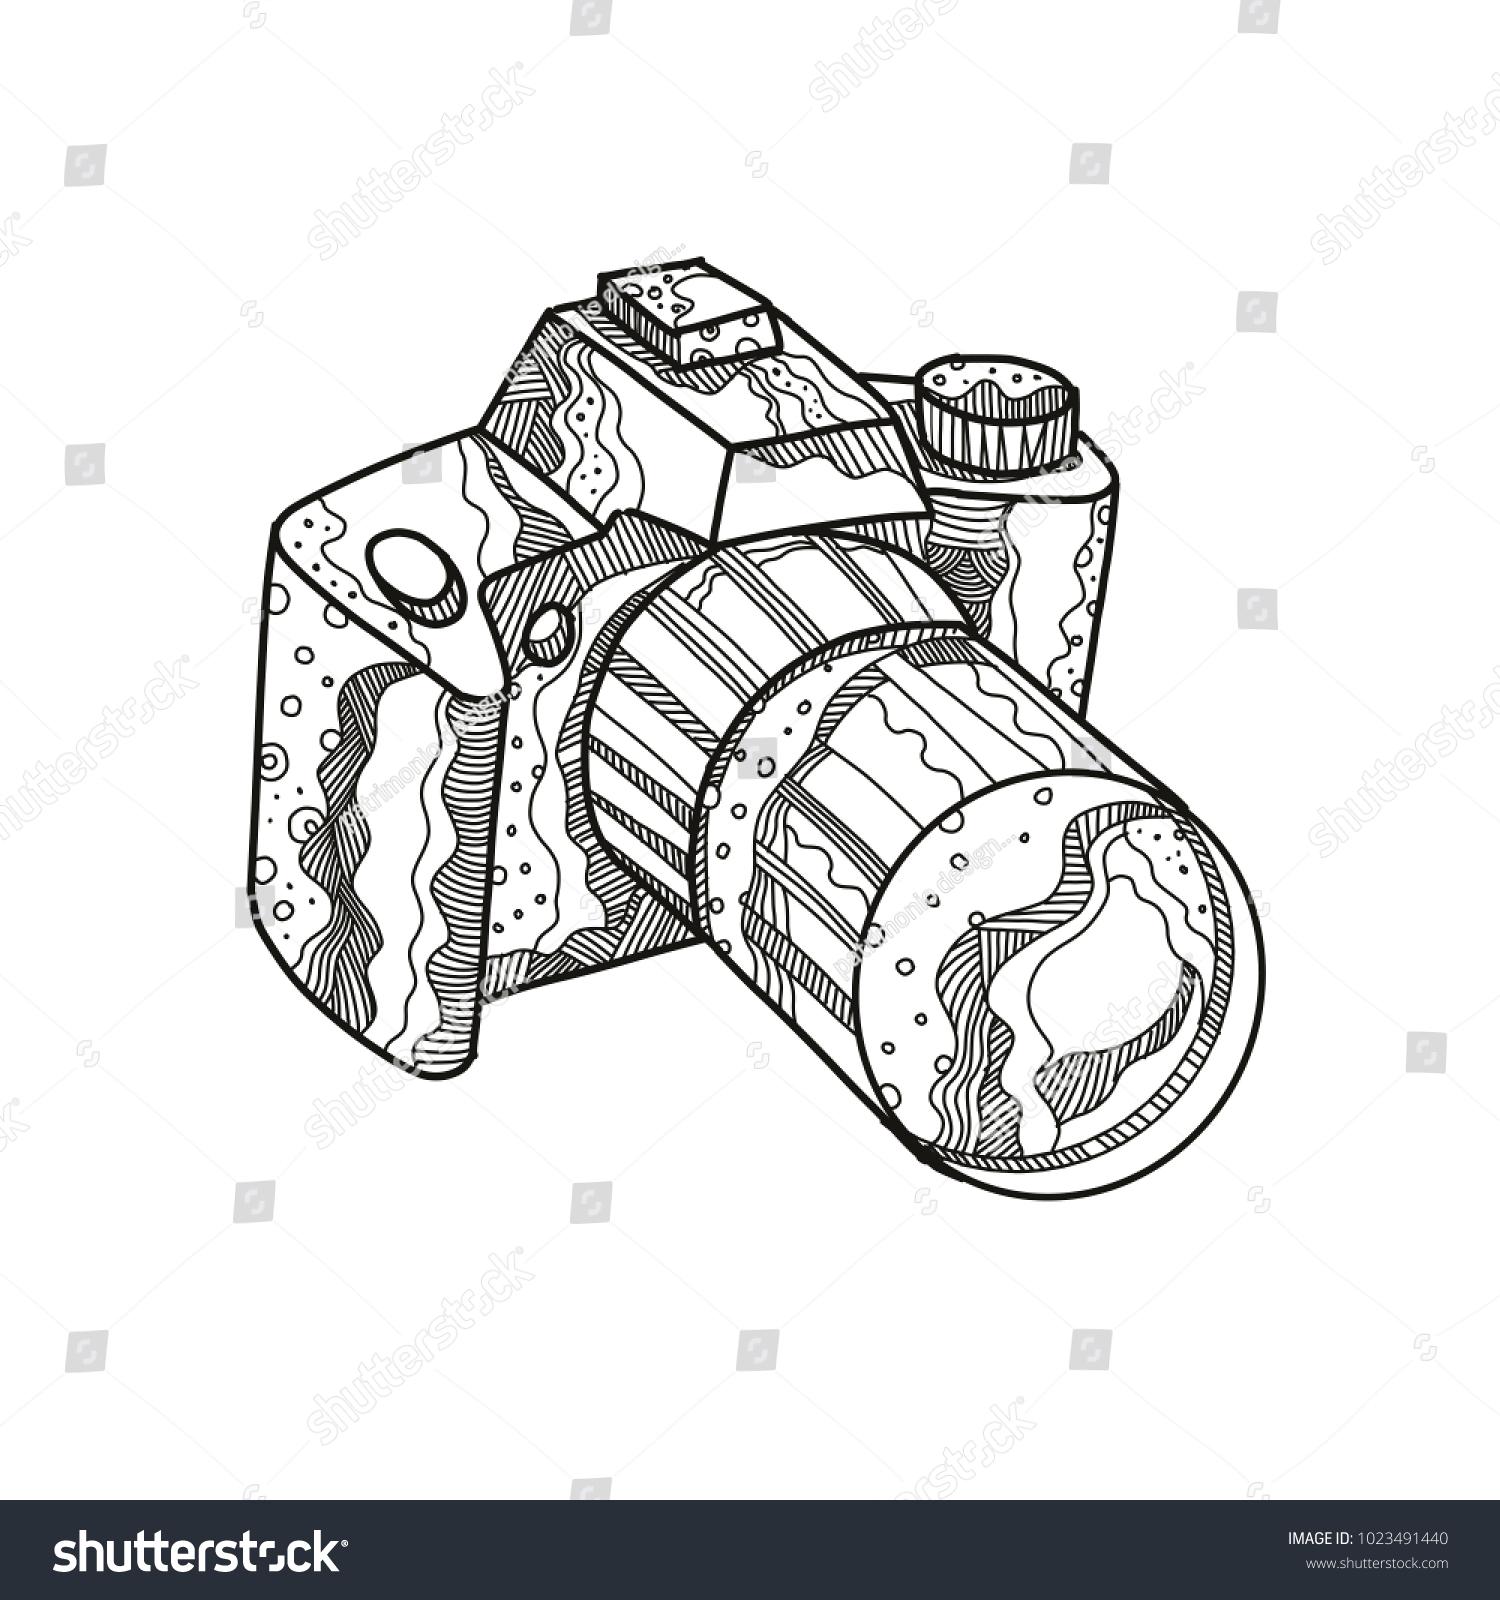 Camera Vintage By Hand Drawing Ez Canvas Diagram Of A Dslr Digital Block